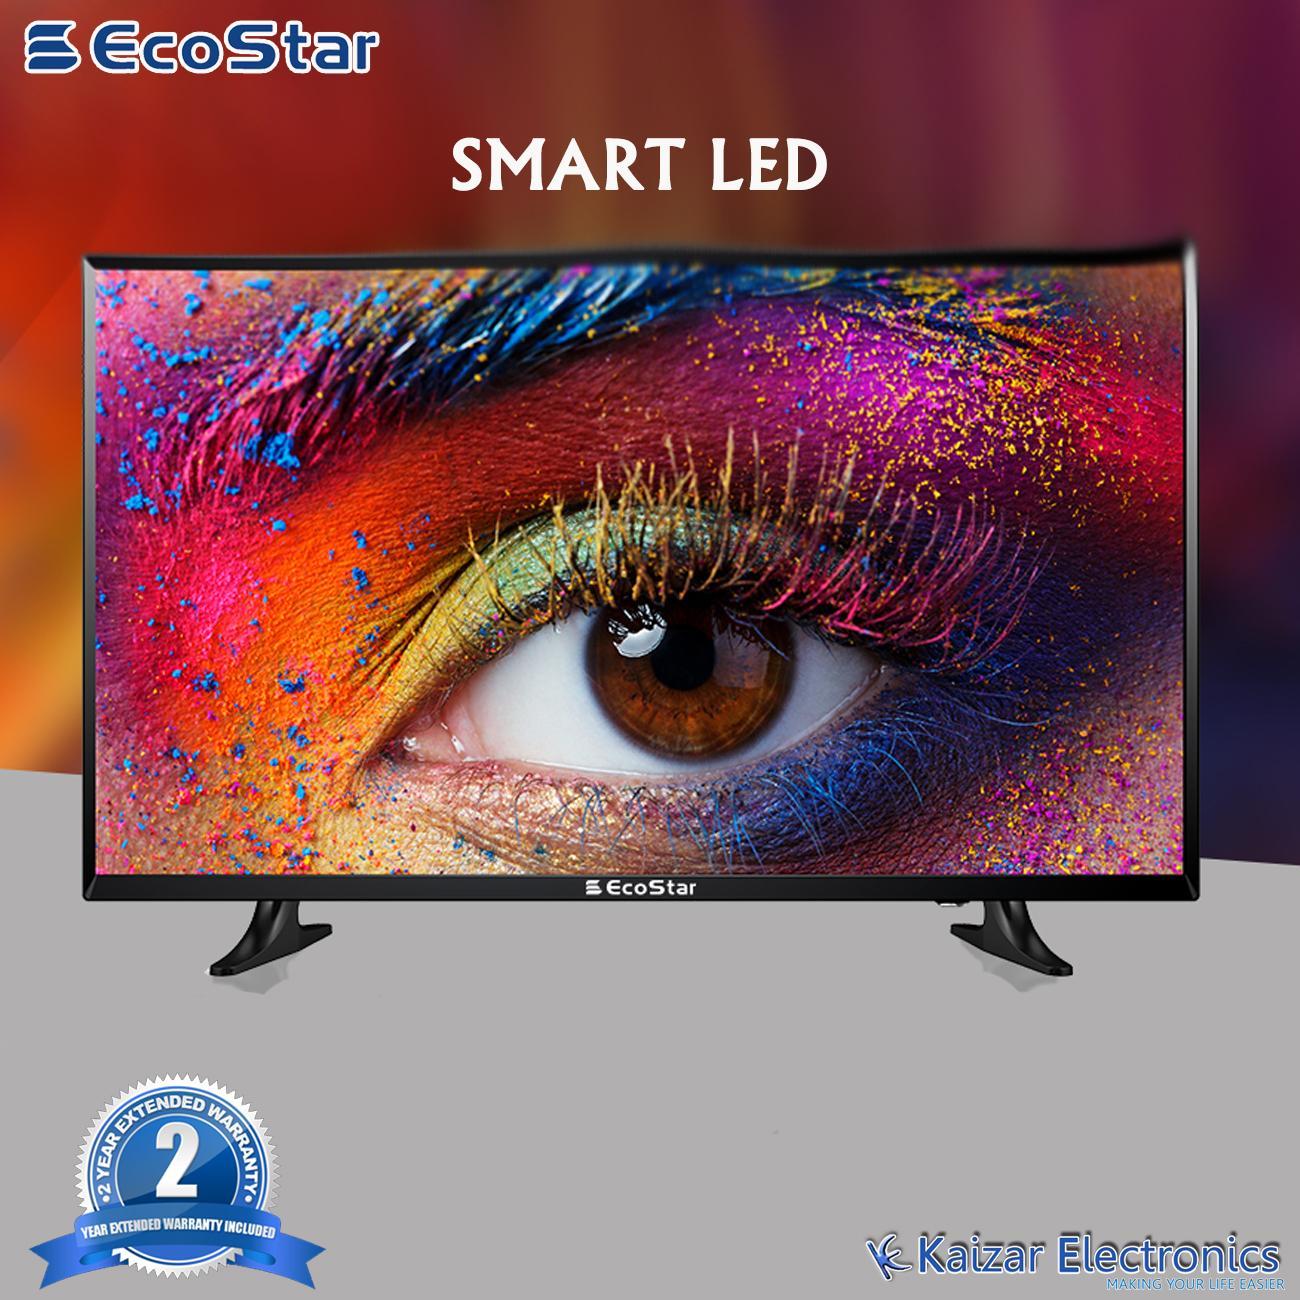 Eco star 32 inch SMART LED TV CX-32U851P